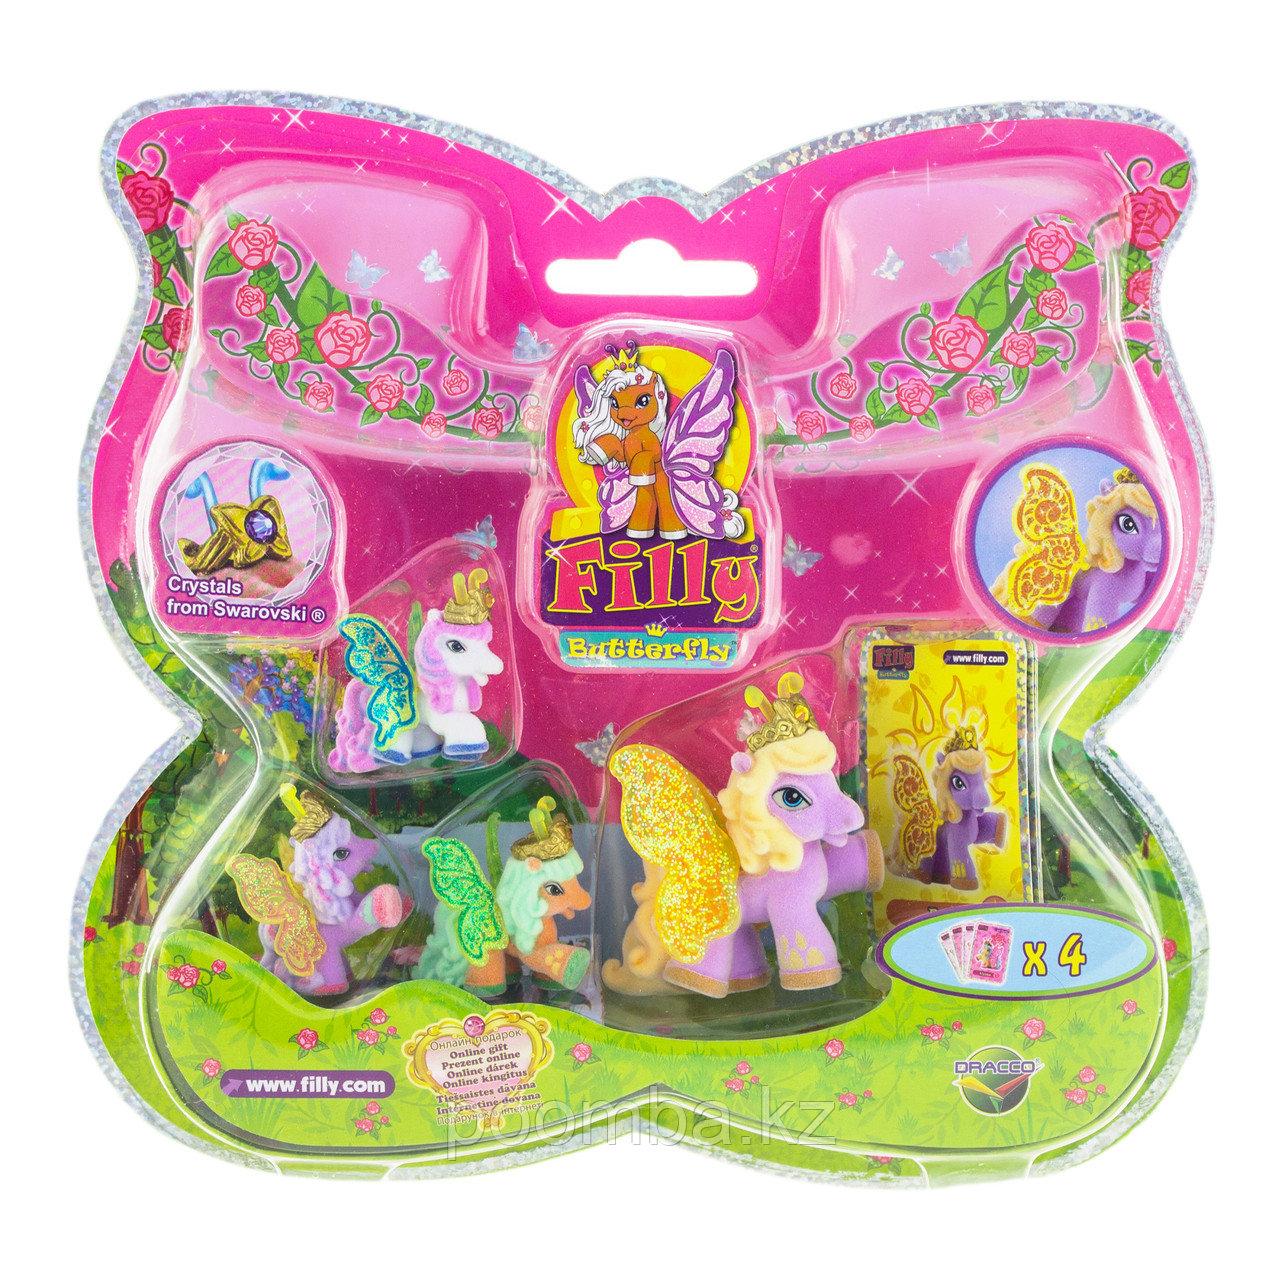 "Большой набор Filly Butterfly Glitter ""Волшебная семья"" - Беа"